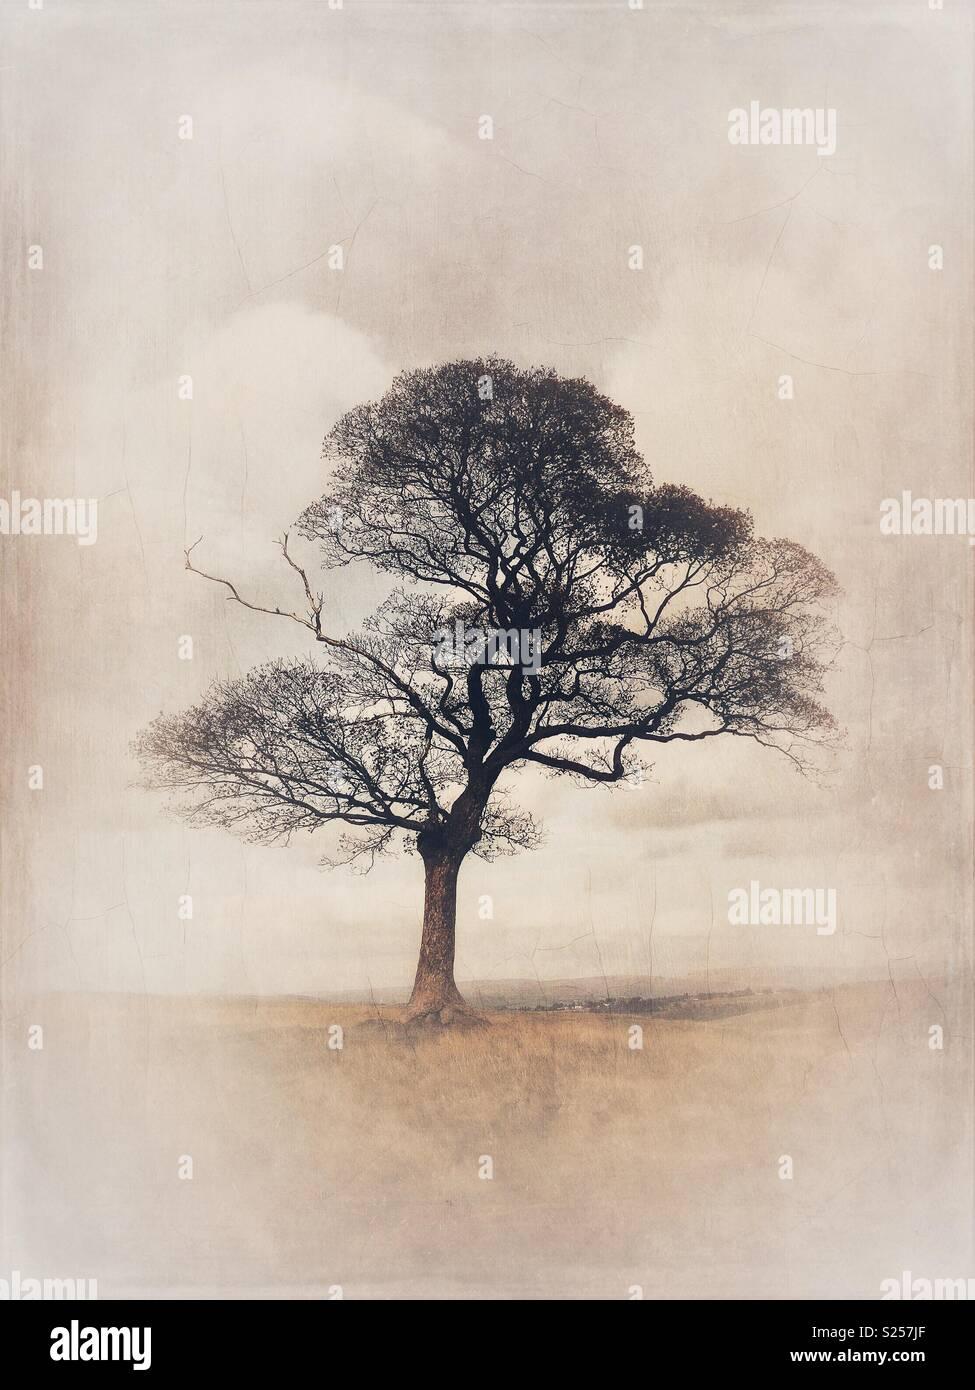 Lone tree - Stock Image